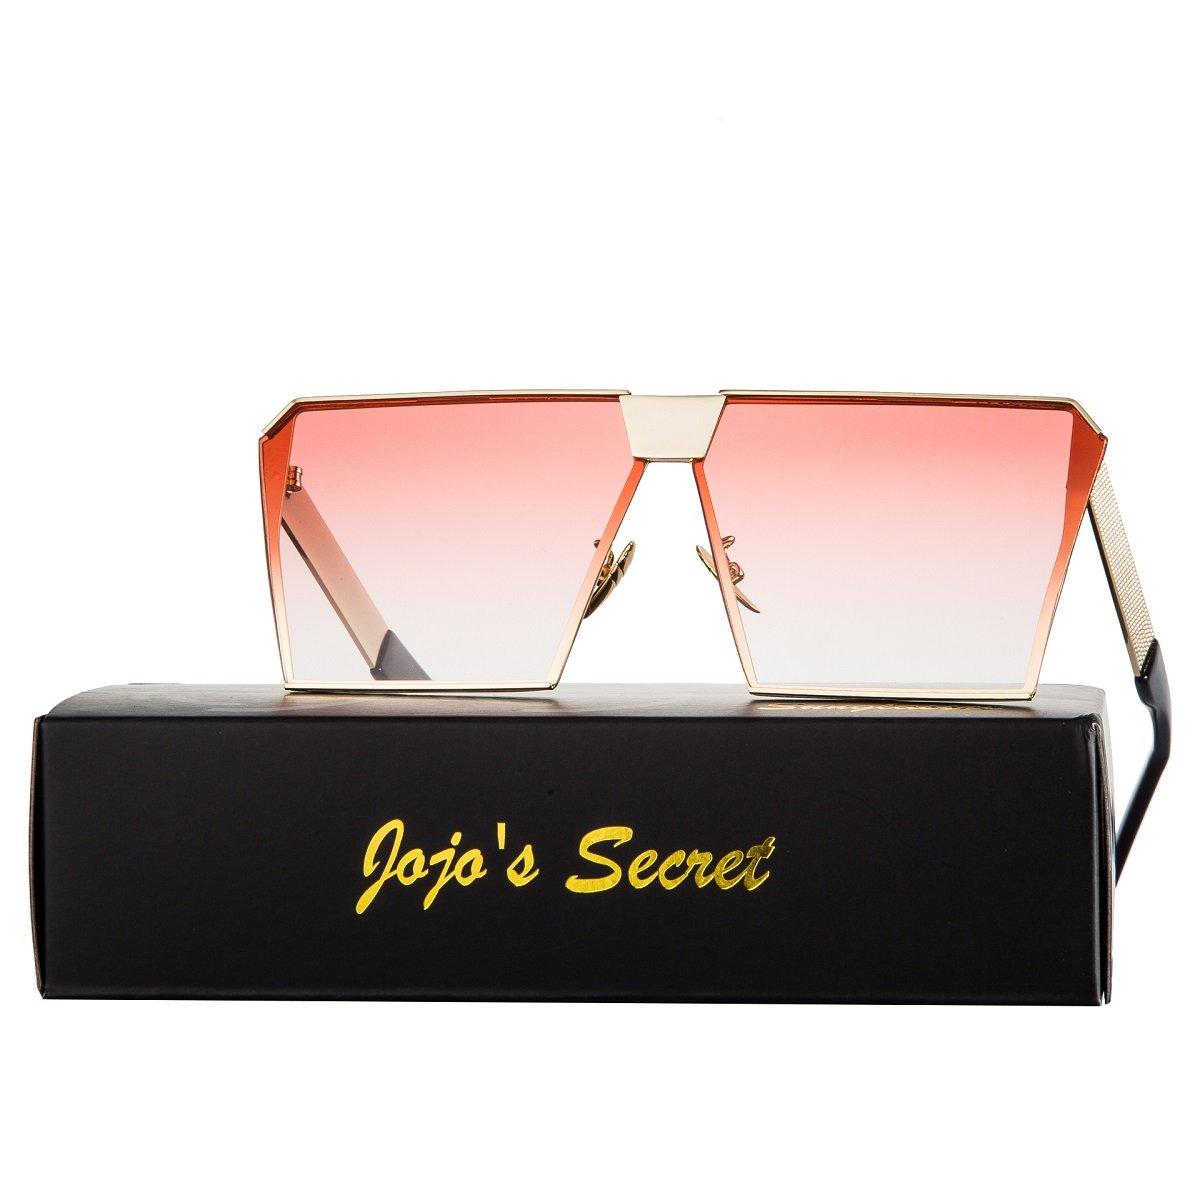 JOJO'S SECRET Oversized Square Sunglasses Metal Frame Flat Top Sunglasses JS009 (Gold/Transparent red, 2.48) by JOJO'S SECRET (Image #1)